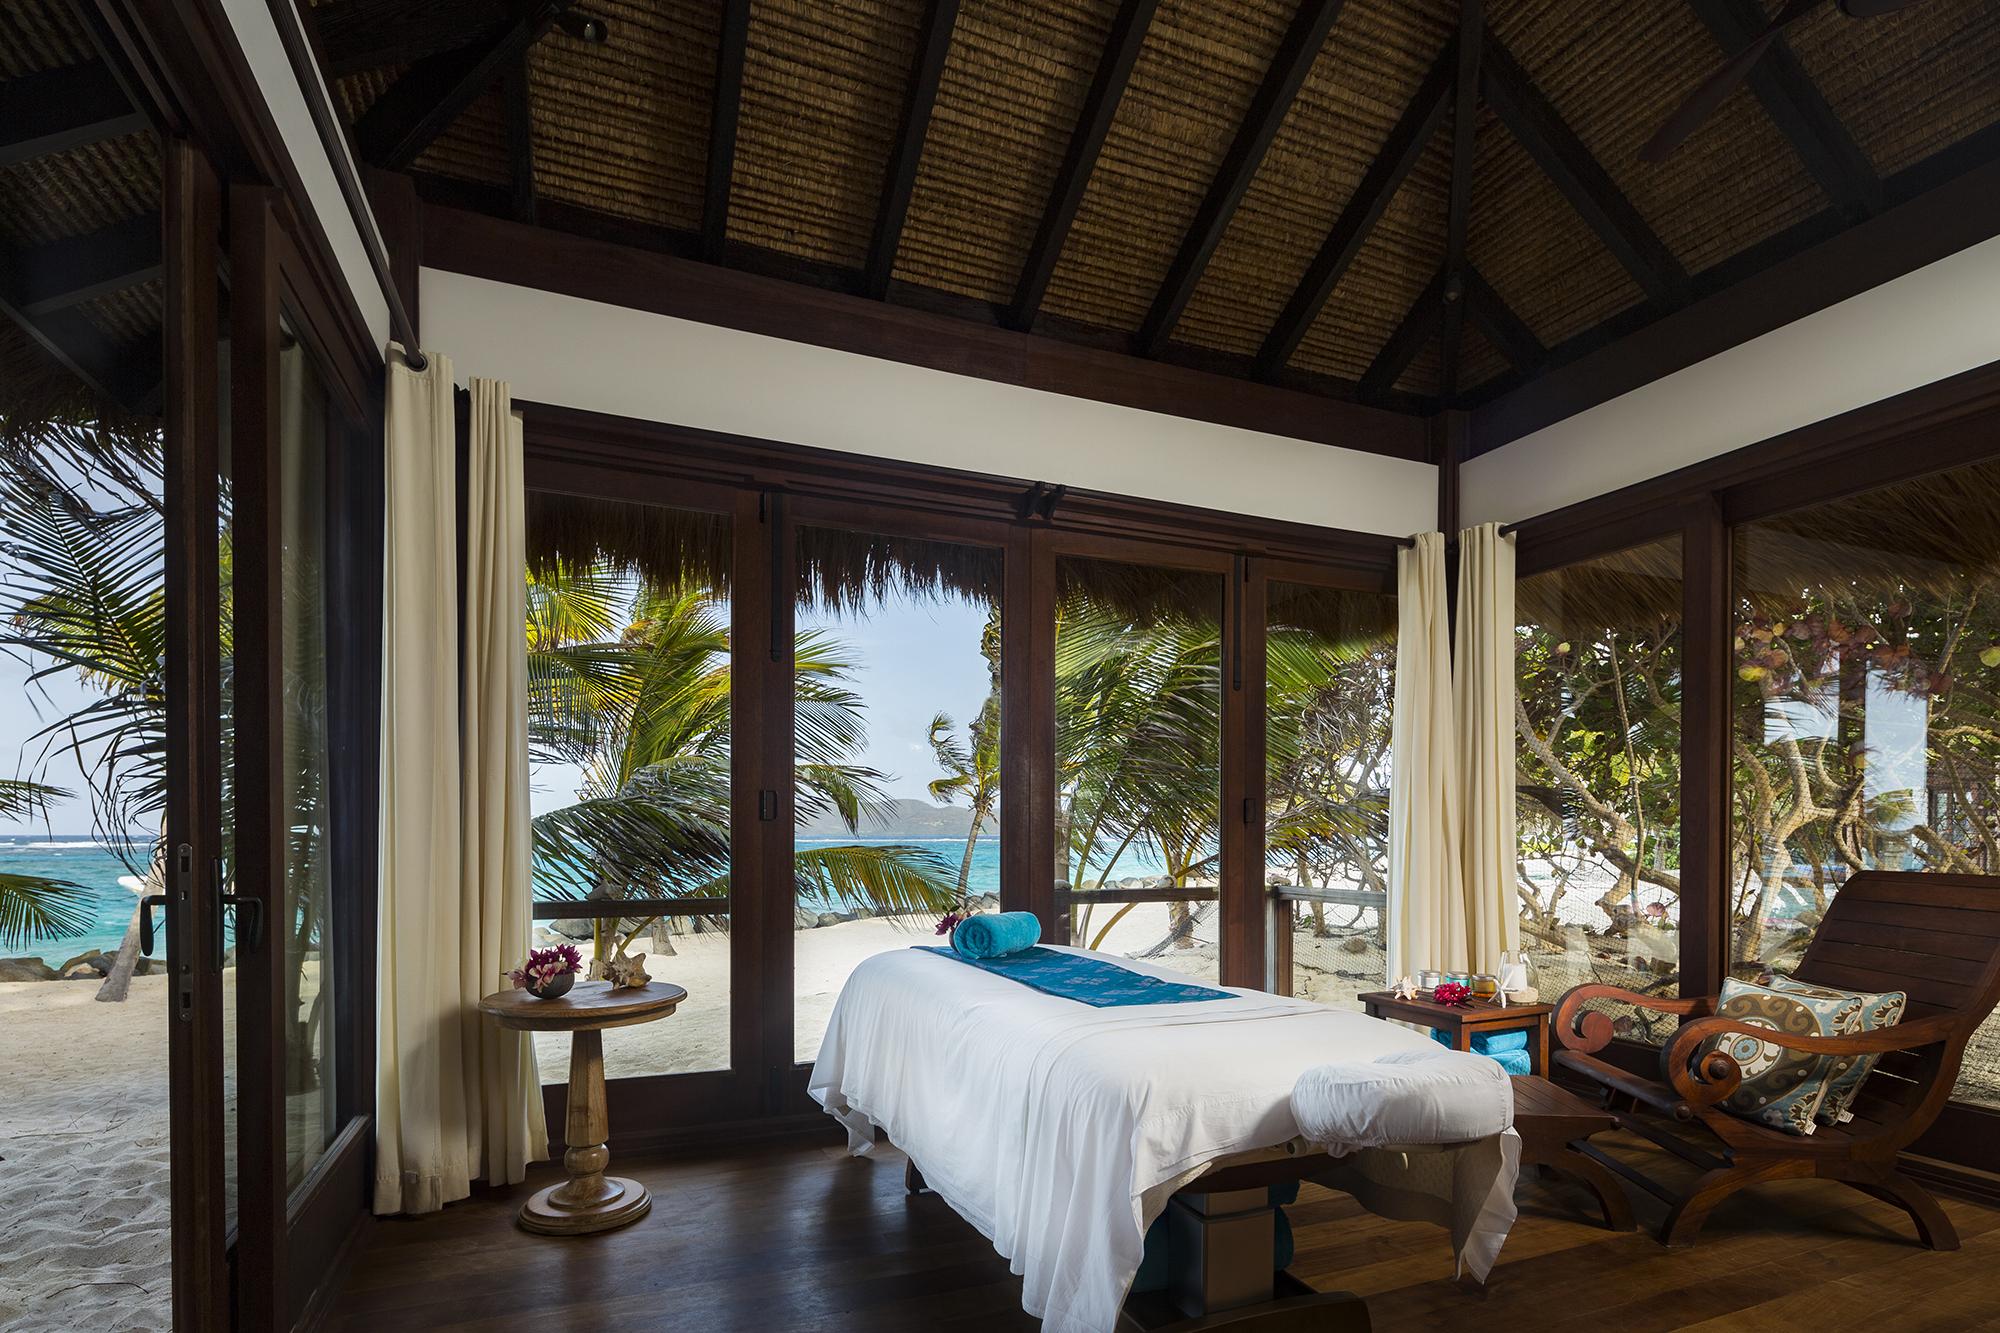 necker-island-bali-samudra-spa-treatment.jpg